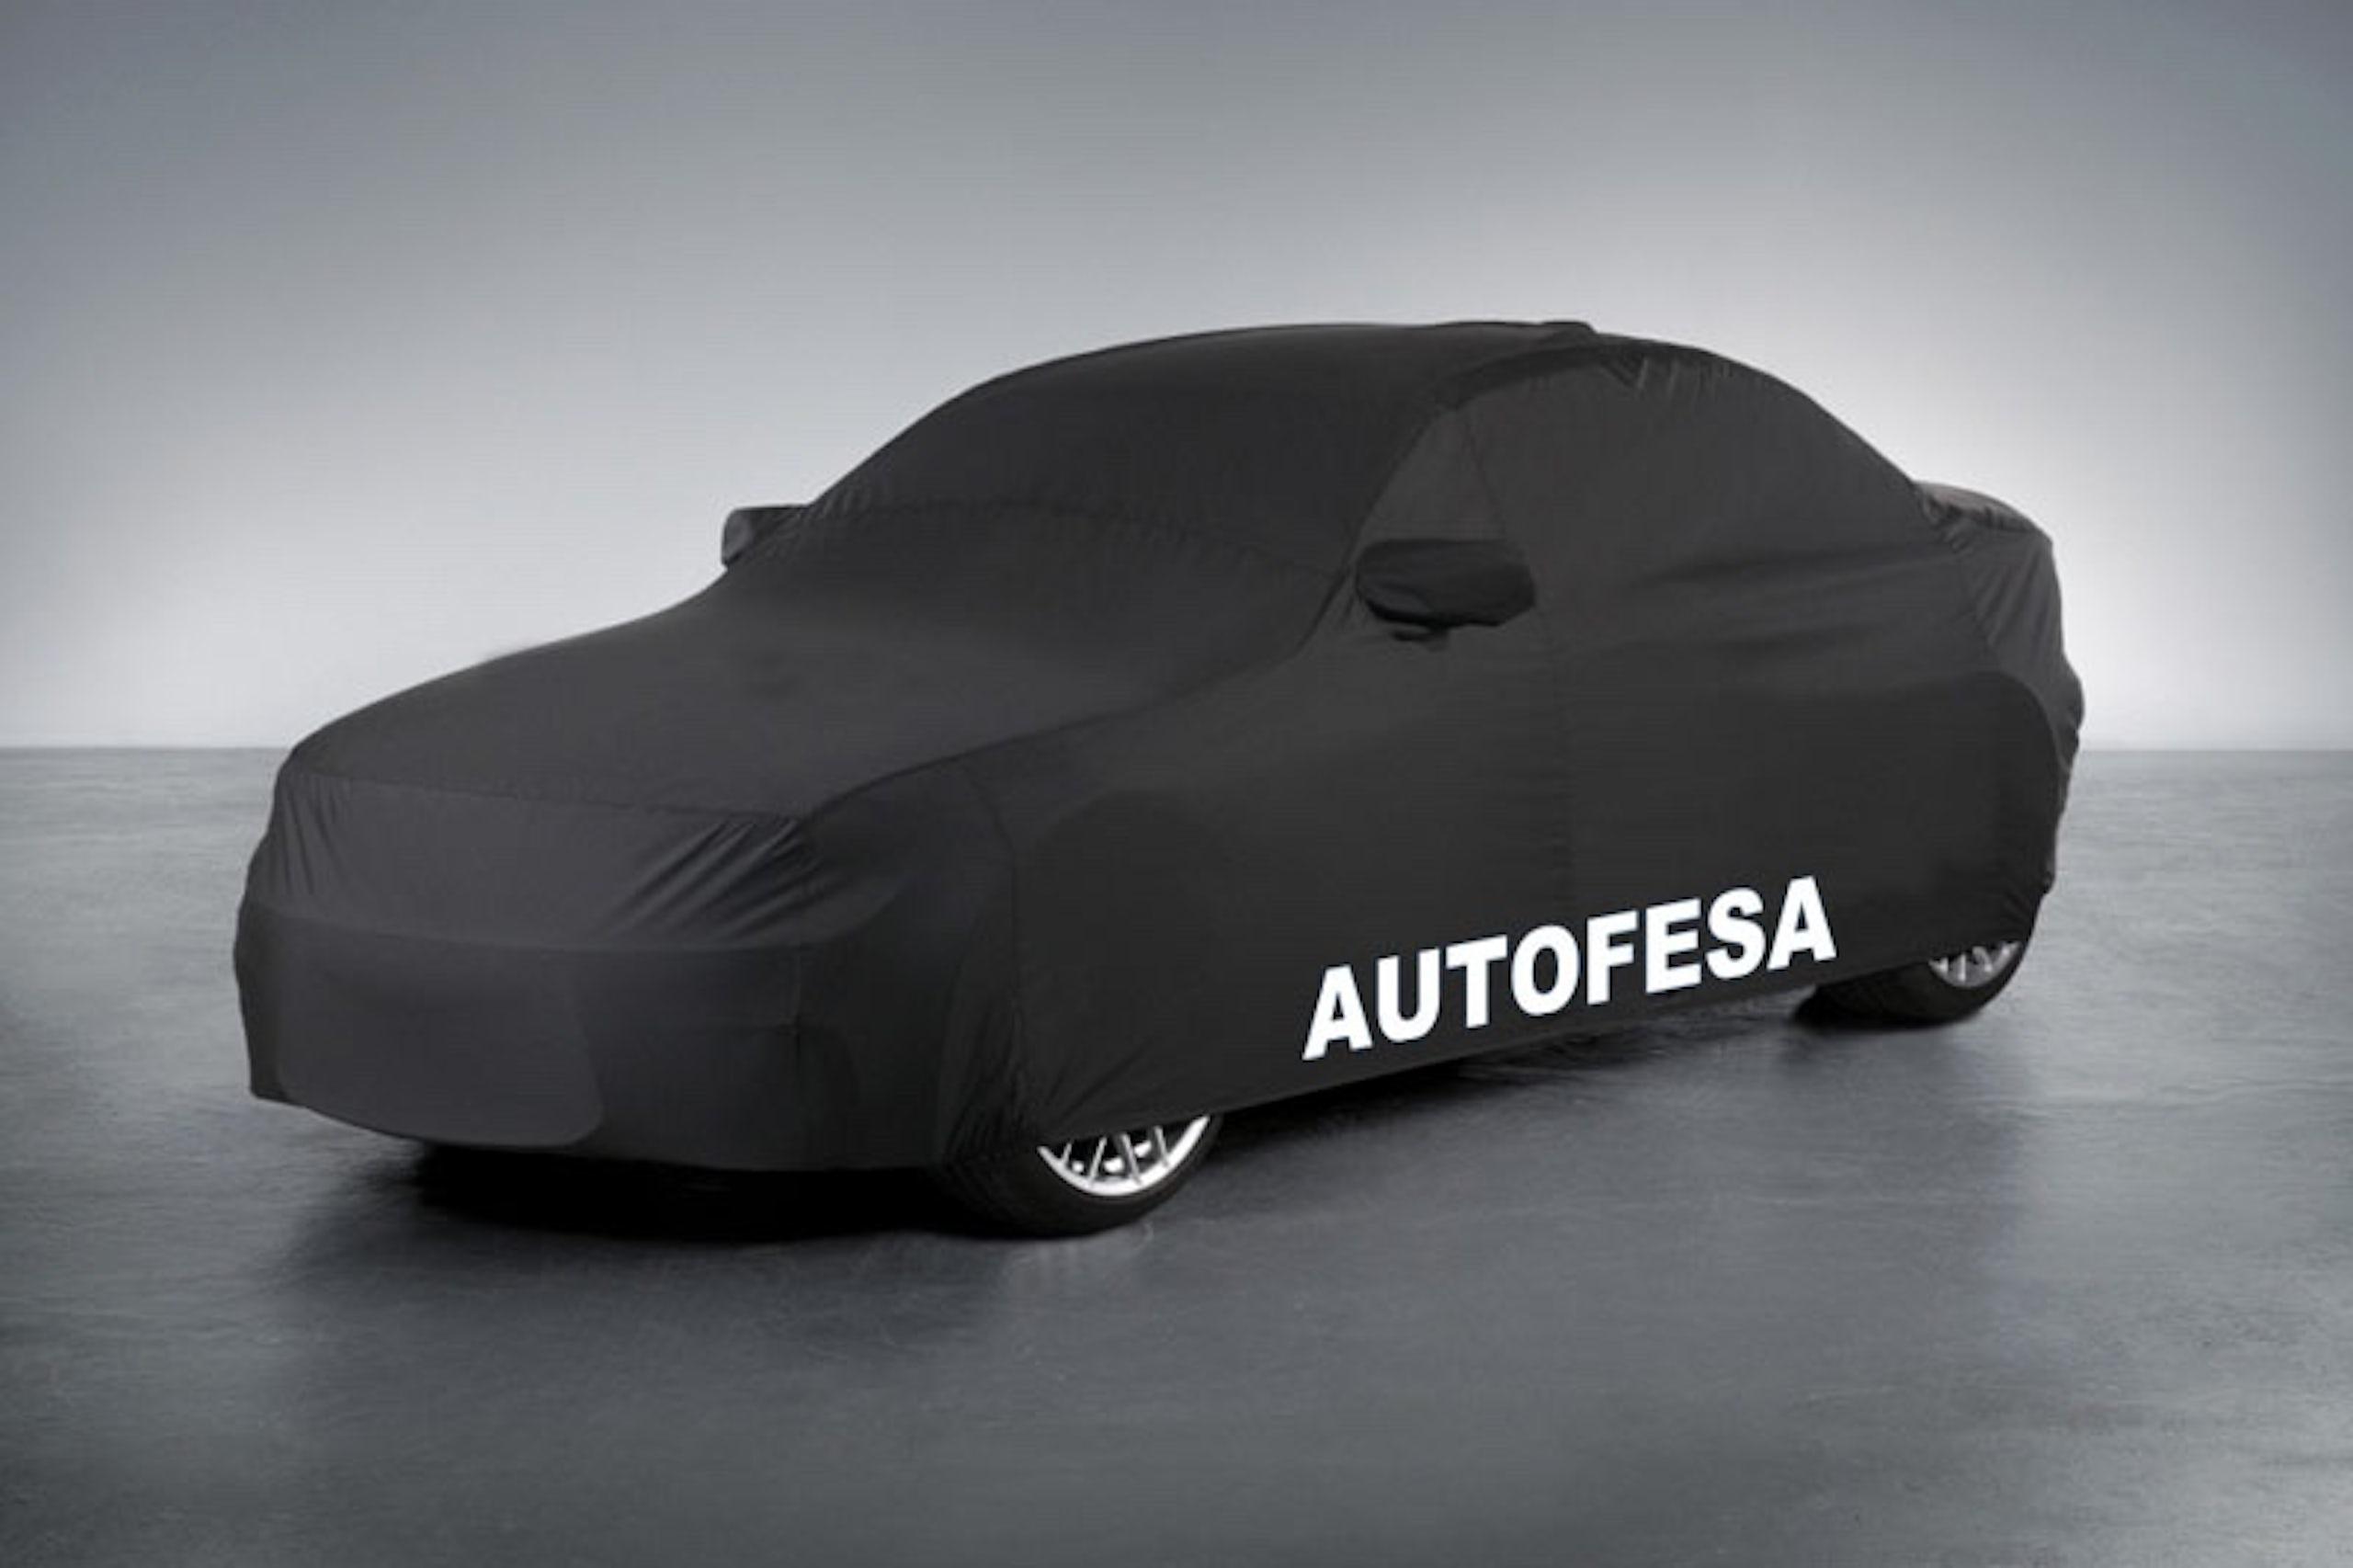 Volvo Xc 60 2.0 T8 Twin Momentum Hybrido Enchufable AWD Auto 407cv 5p S/S - Foto 19